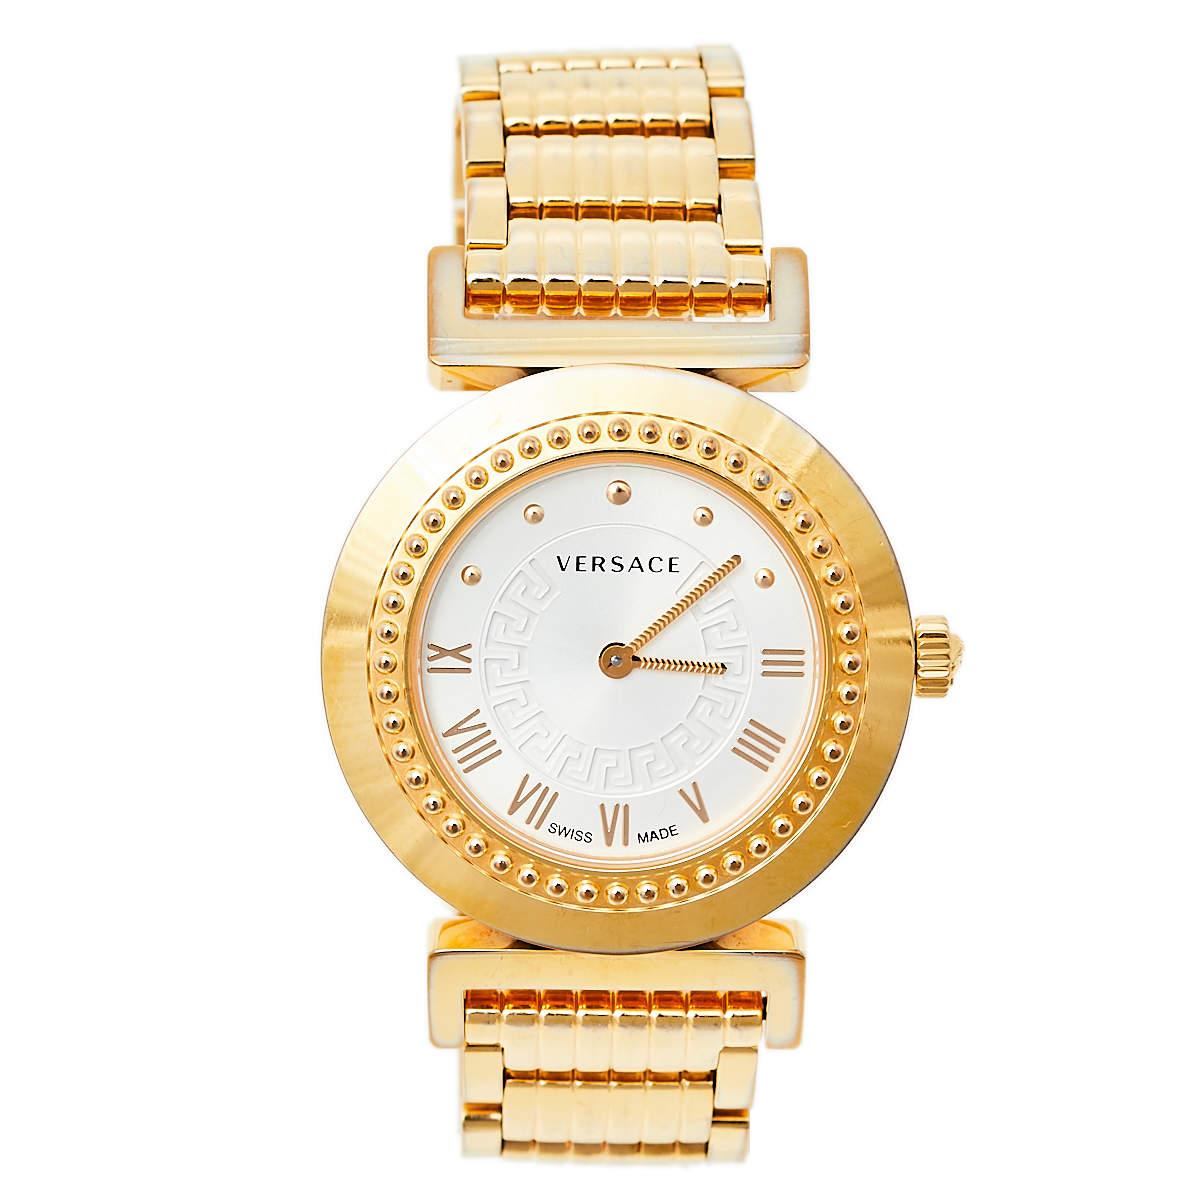 Versace Opaline White Yellow Gold Tone Stainless Steel Vanity P5Q Women's Wristwatch 35 mm